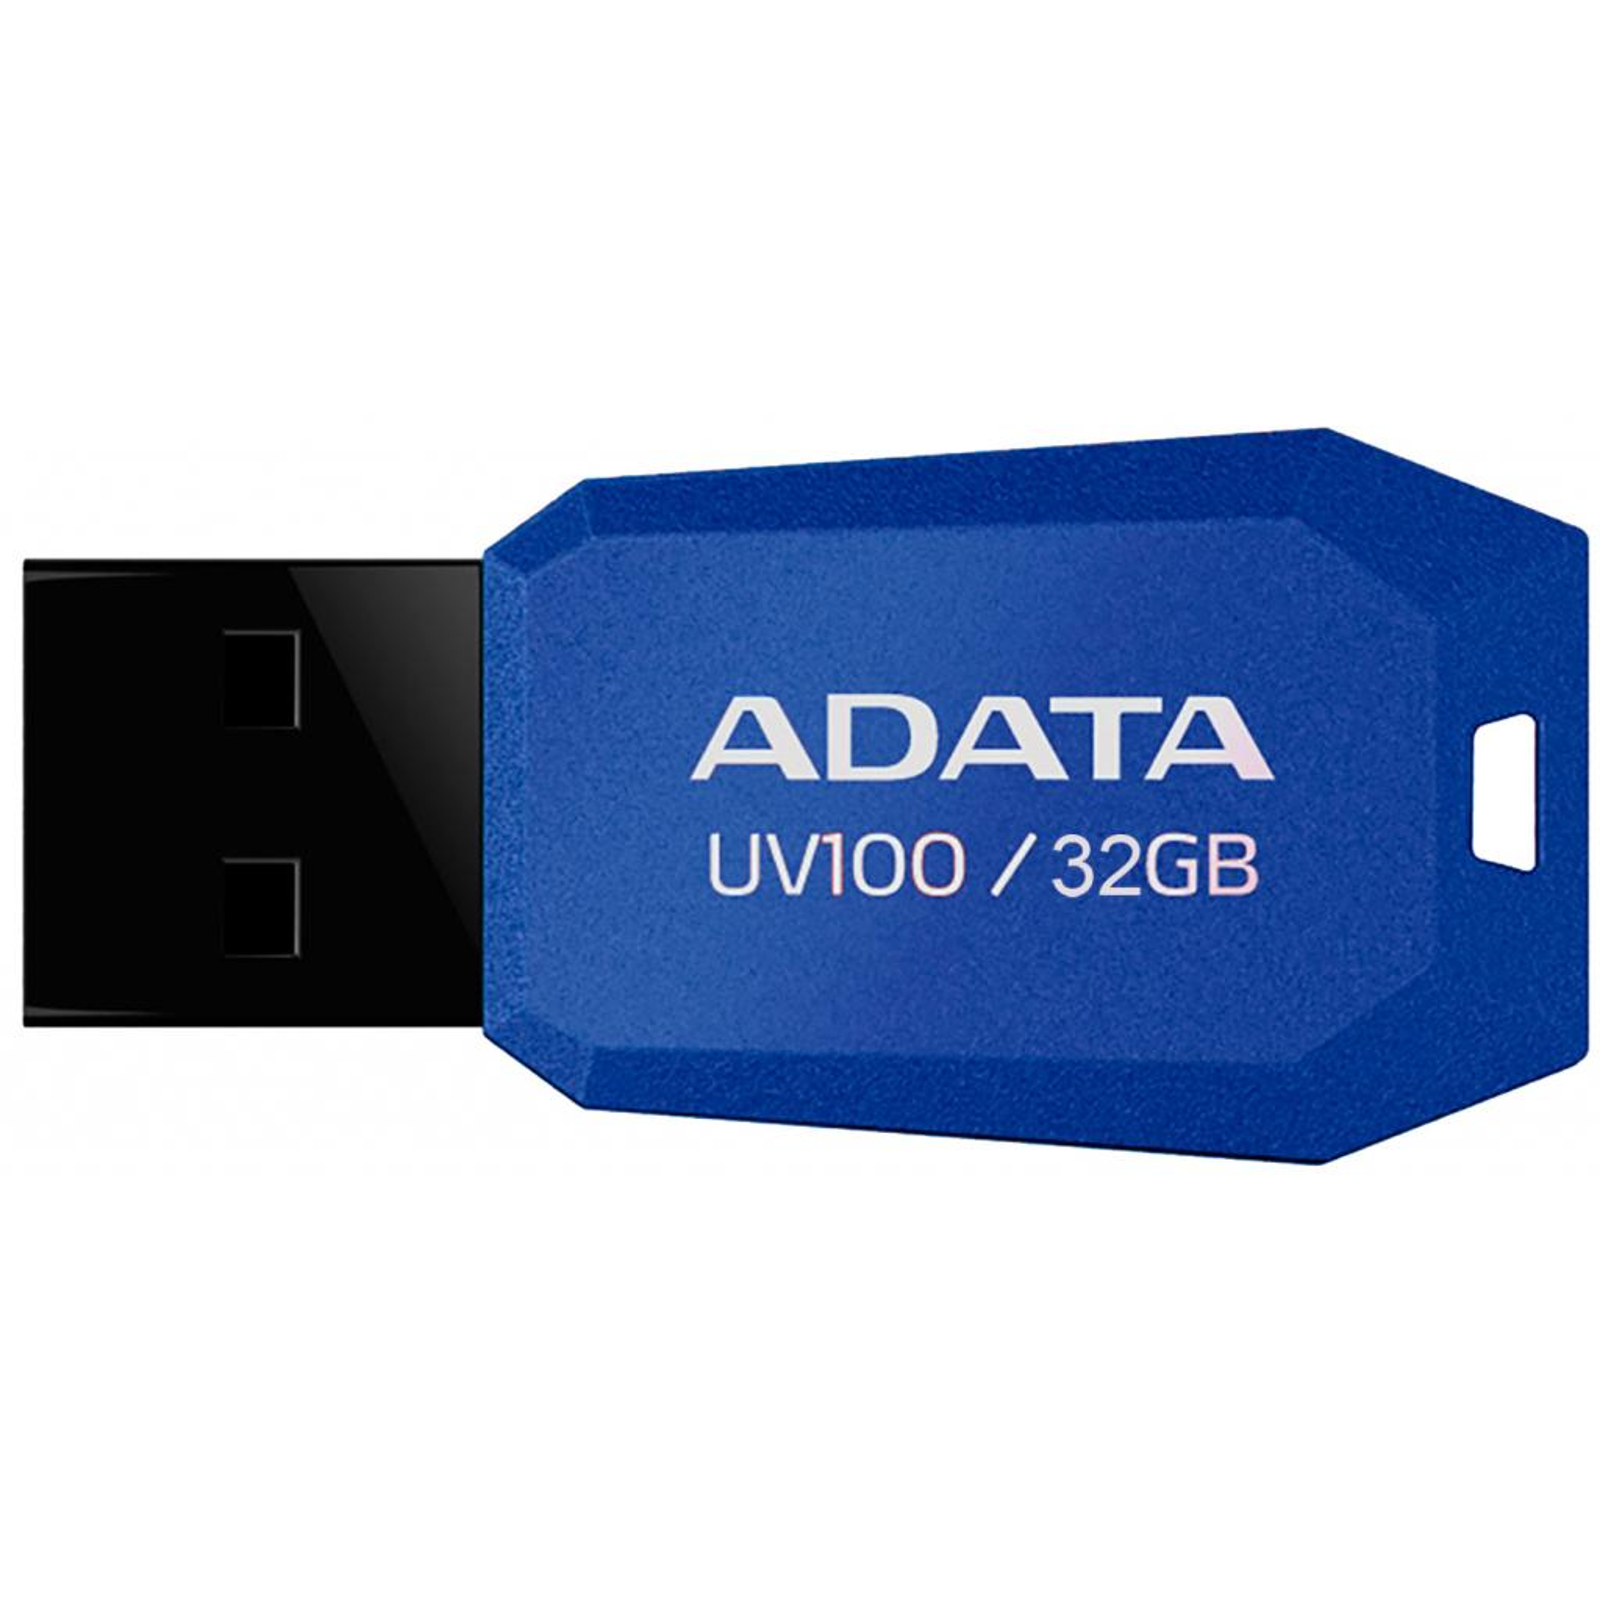 USB флеш накопитель ADATA 32GB DashDrive UV100 Blue USB 2.0 (AUV100-32G-RBL)